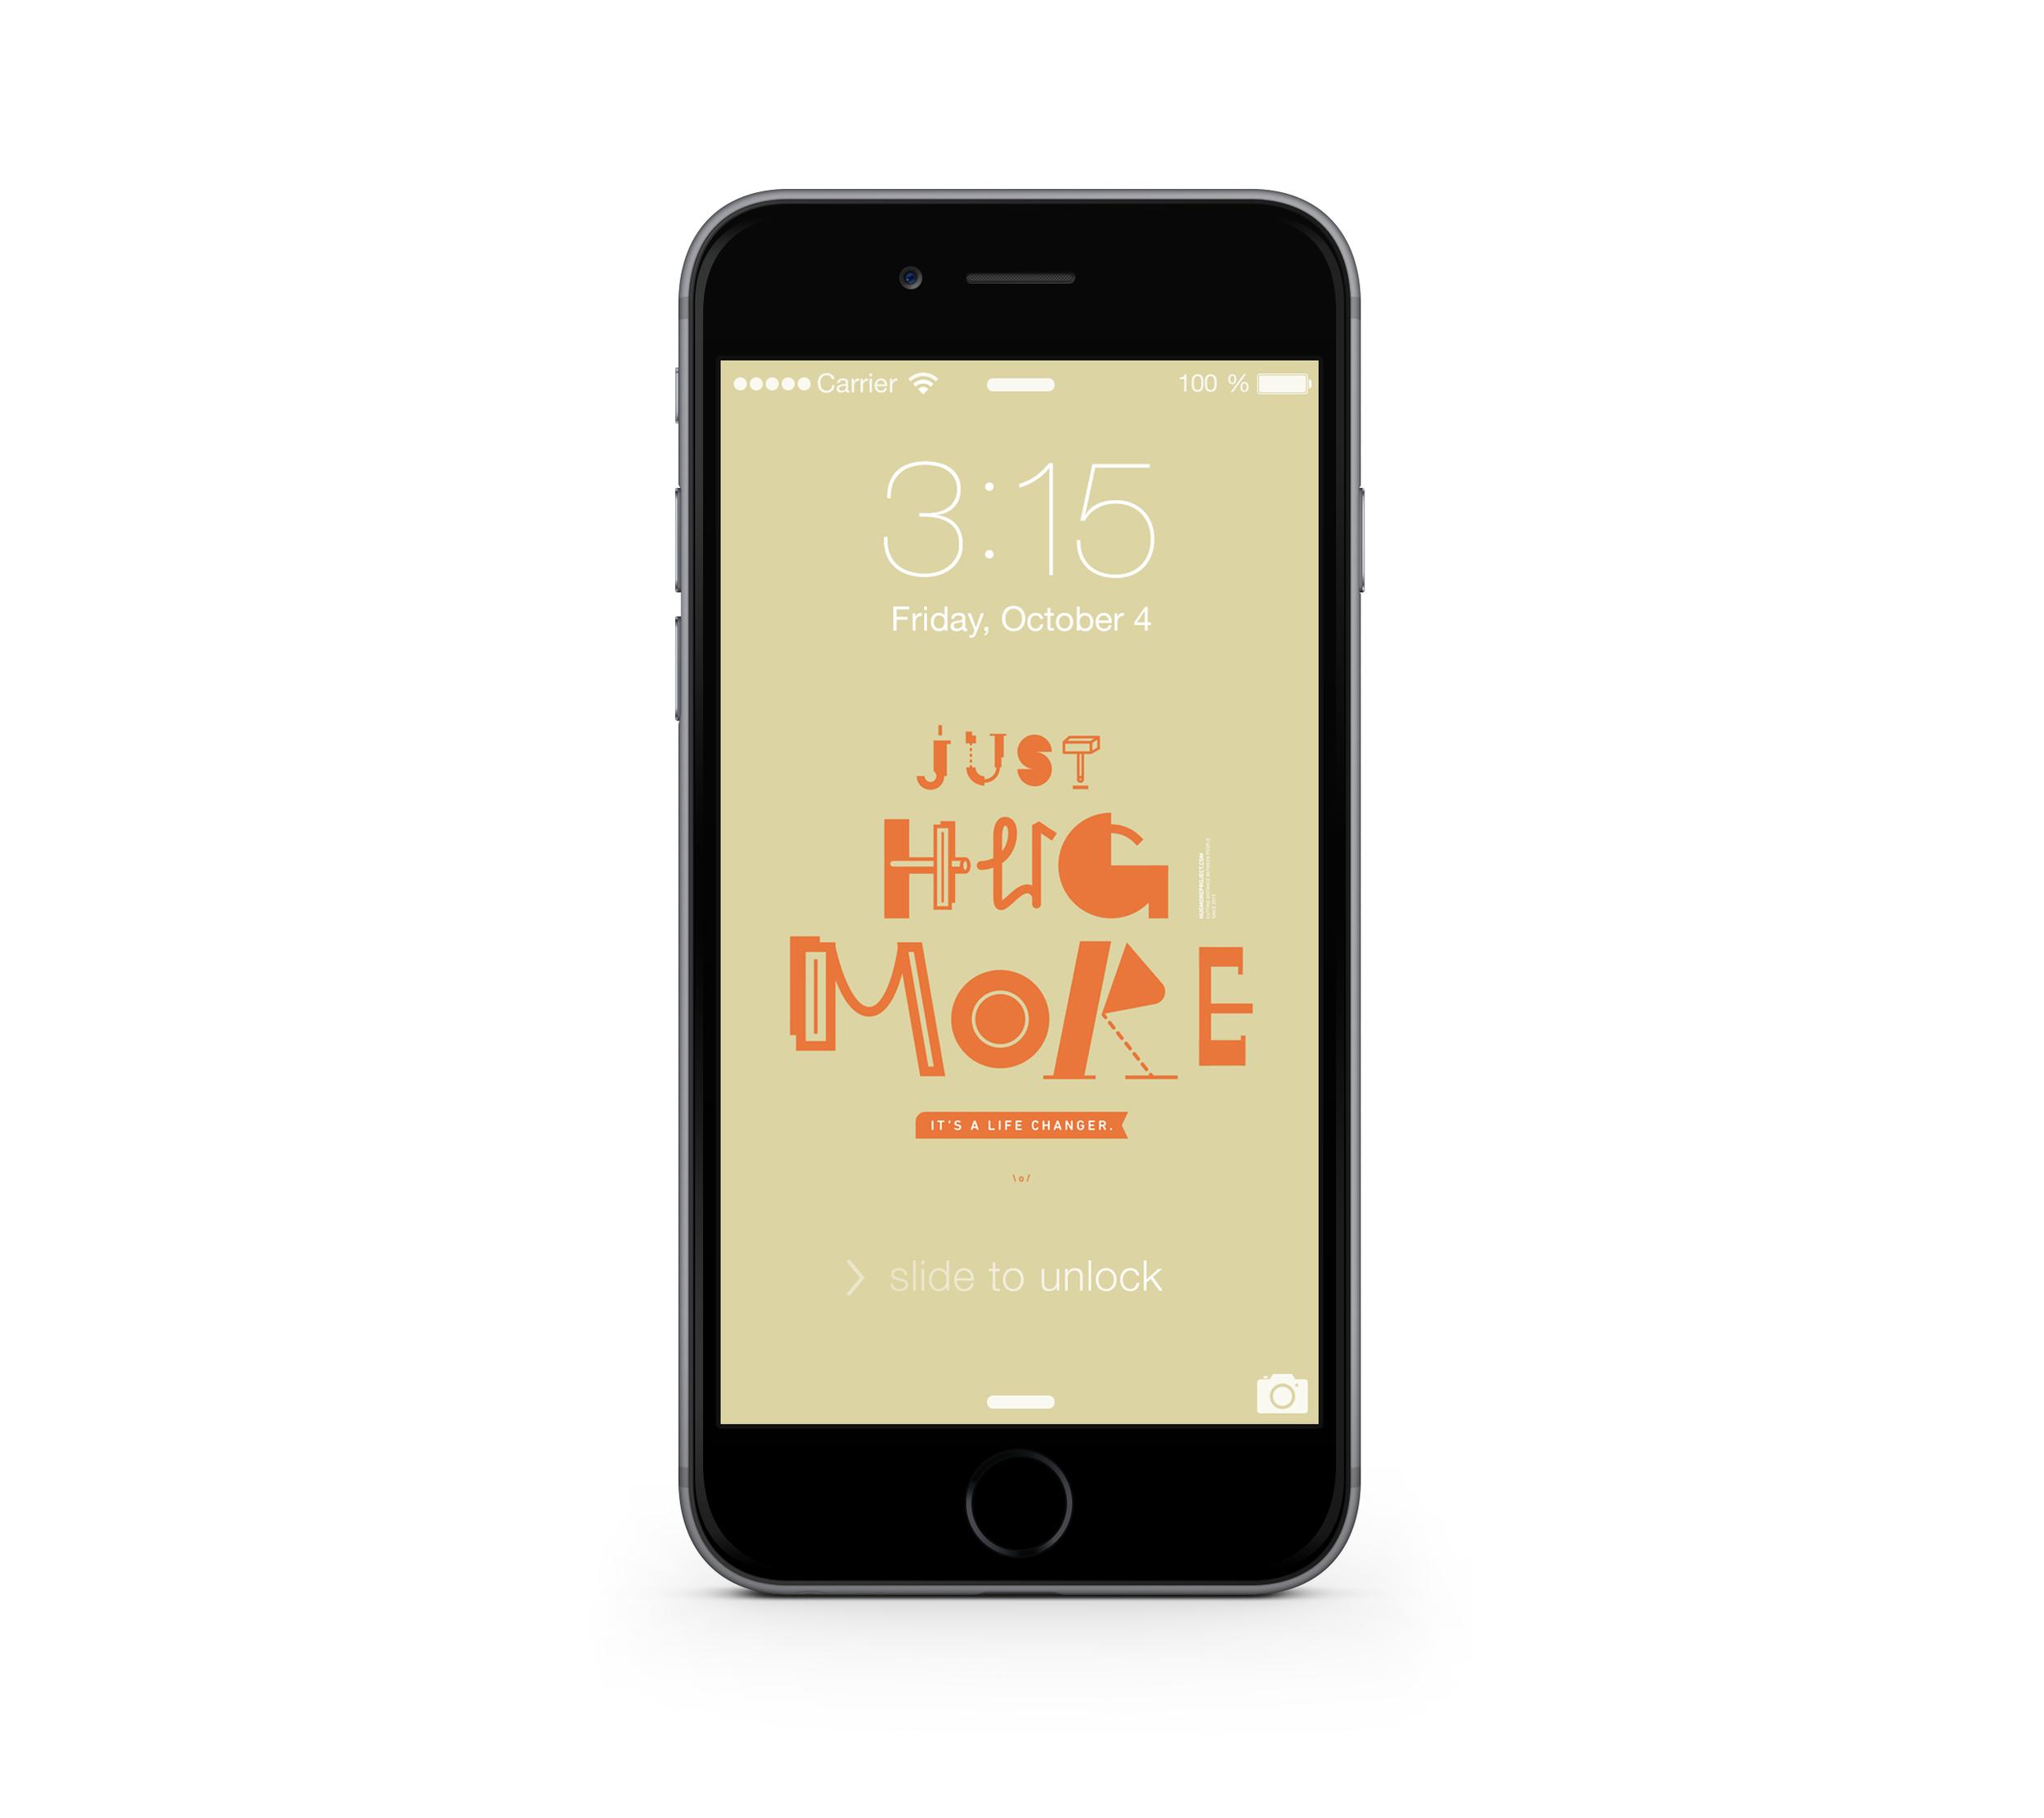 just-hug-more-typo-006-iPhone-mockup-onwhite.jpg